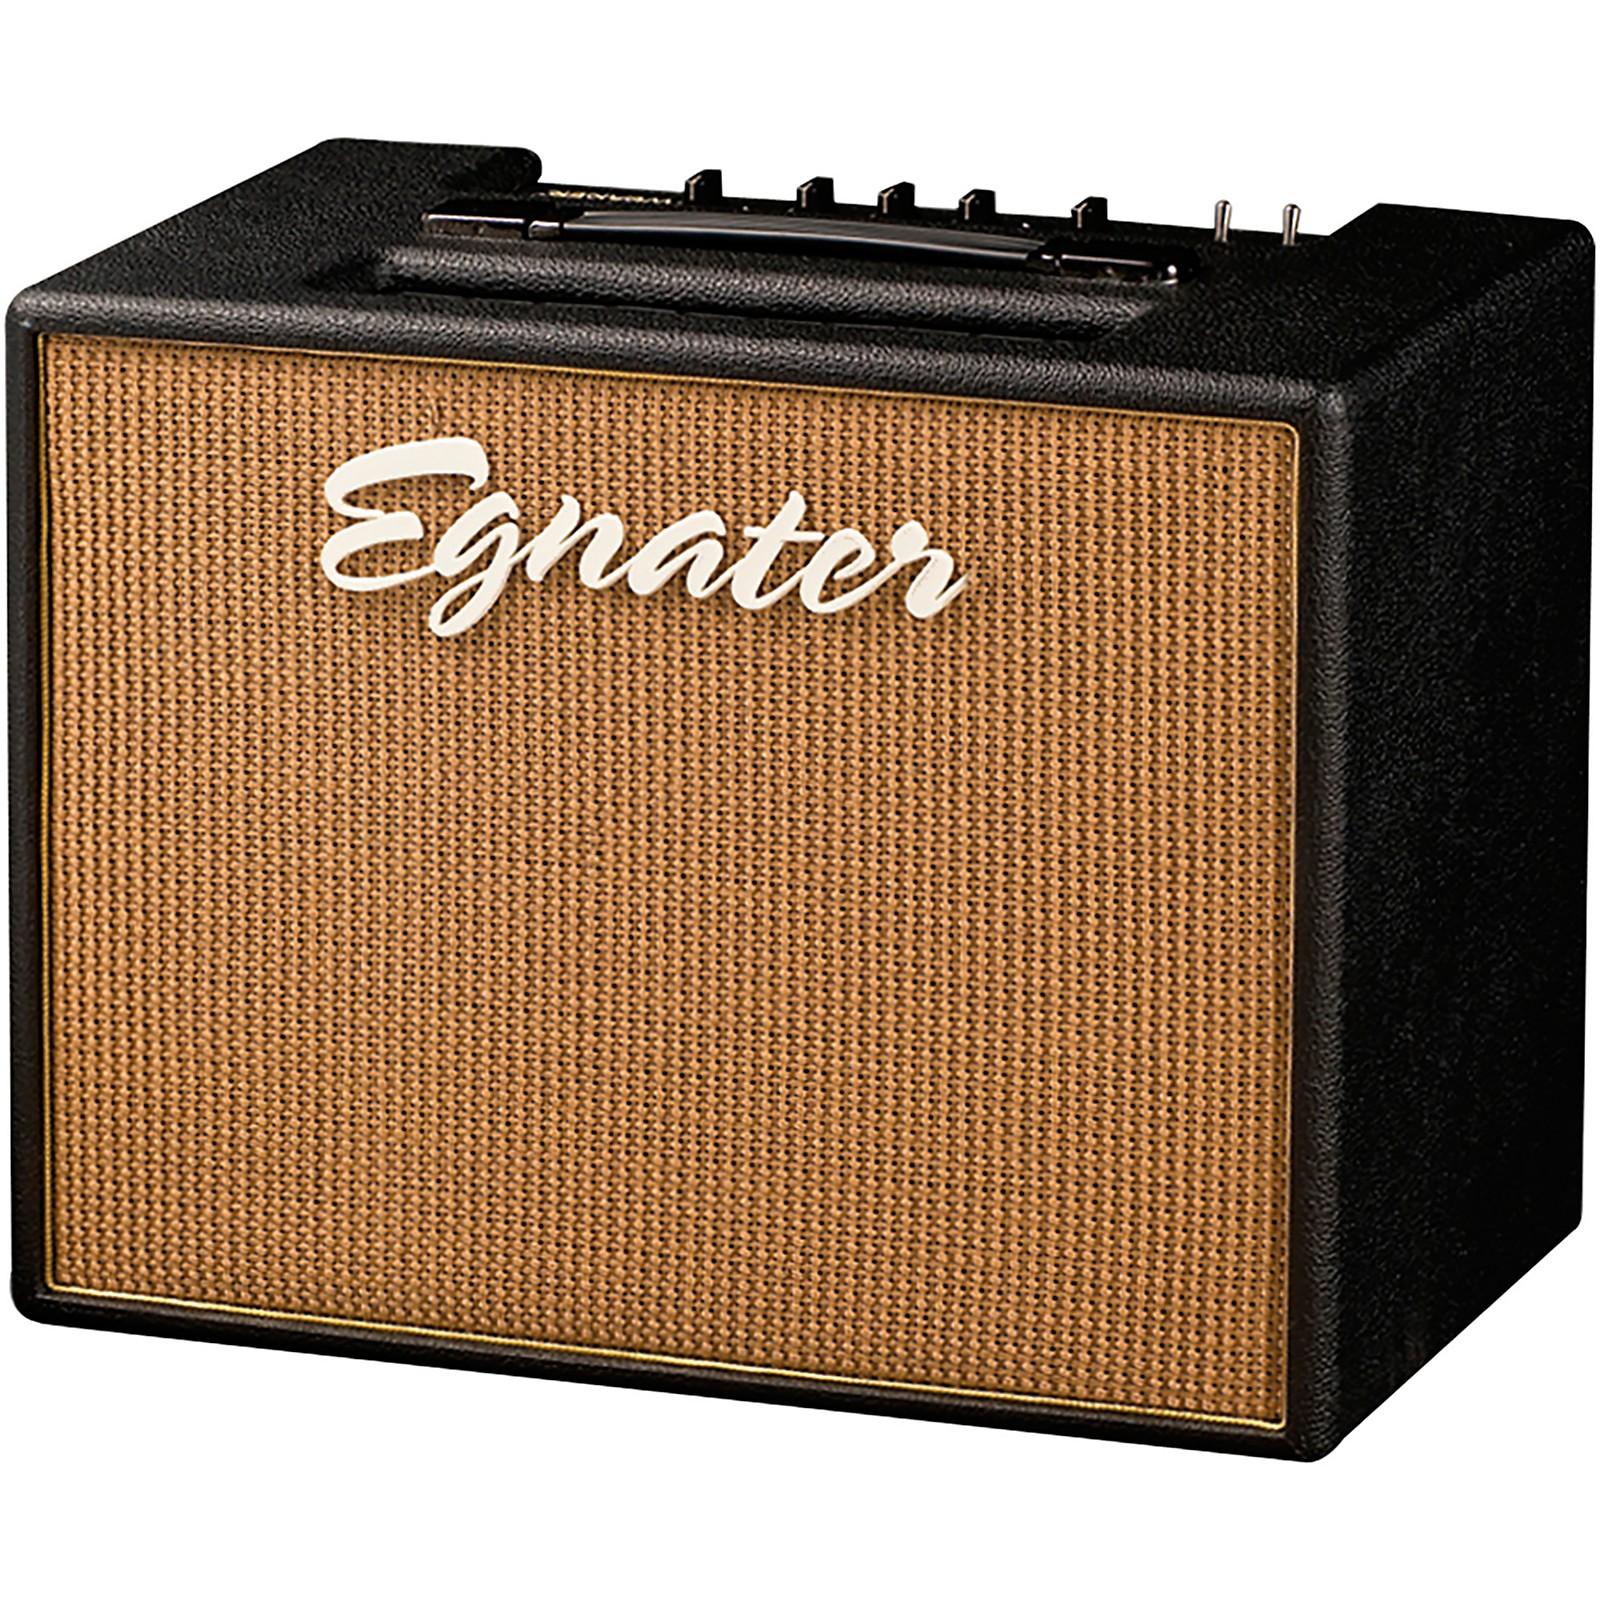 Open Box Egnater Tweaker 112 15W 1x12 Tube Guitar Combo Amp